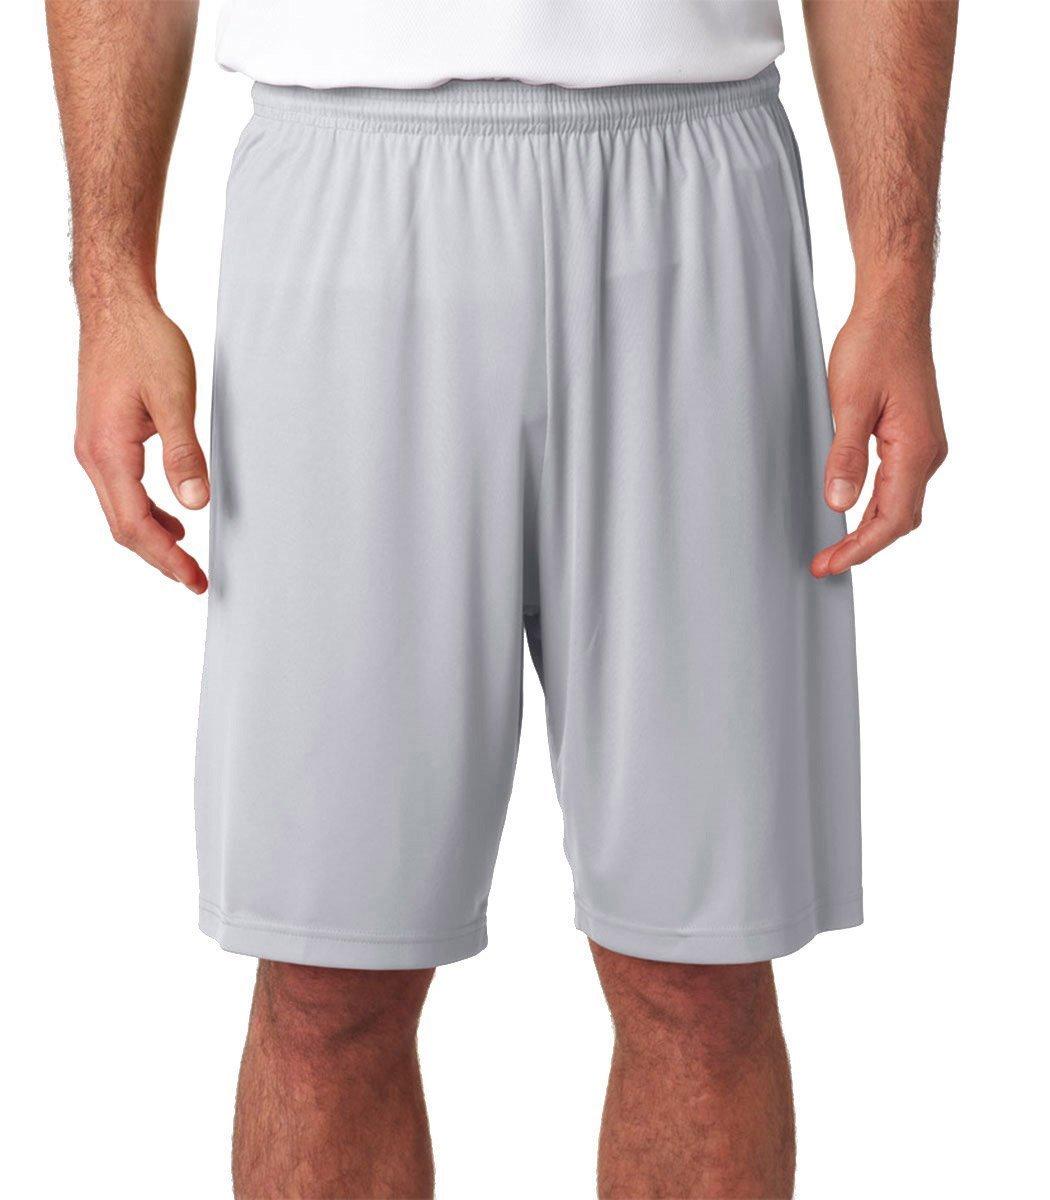 A4 22,9 cm cm cm Kühlleistung Shorts B00BPXPCQS Shorts Billig 37e98e